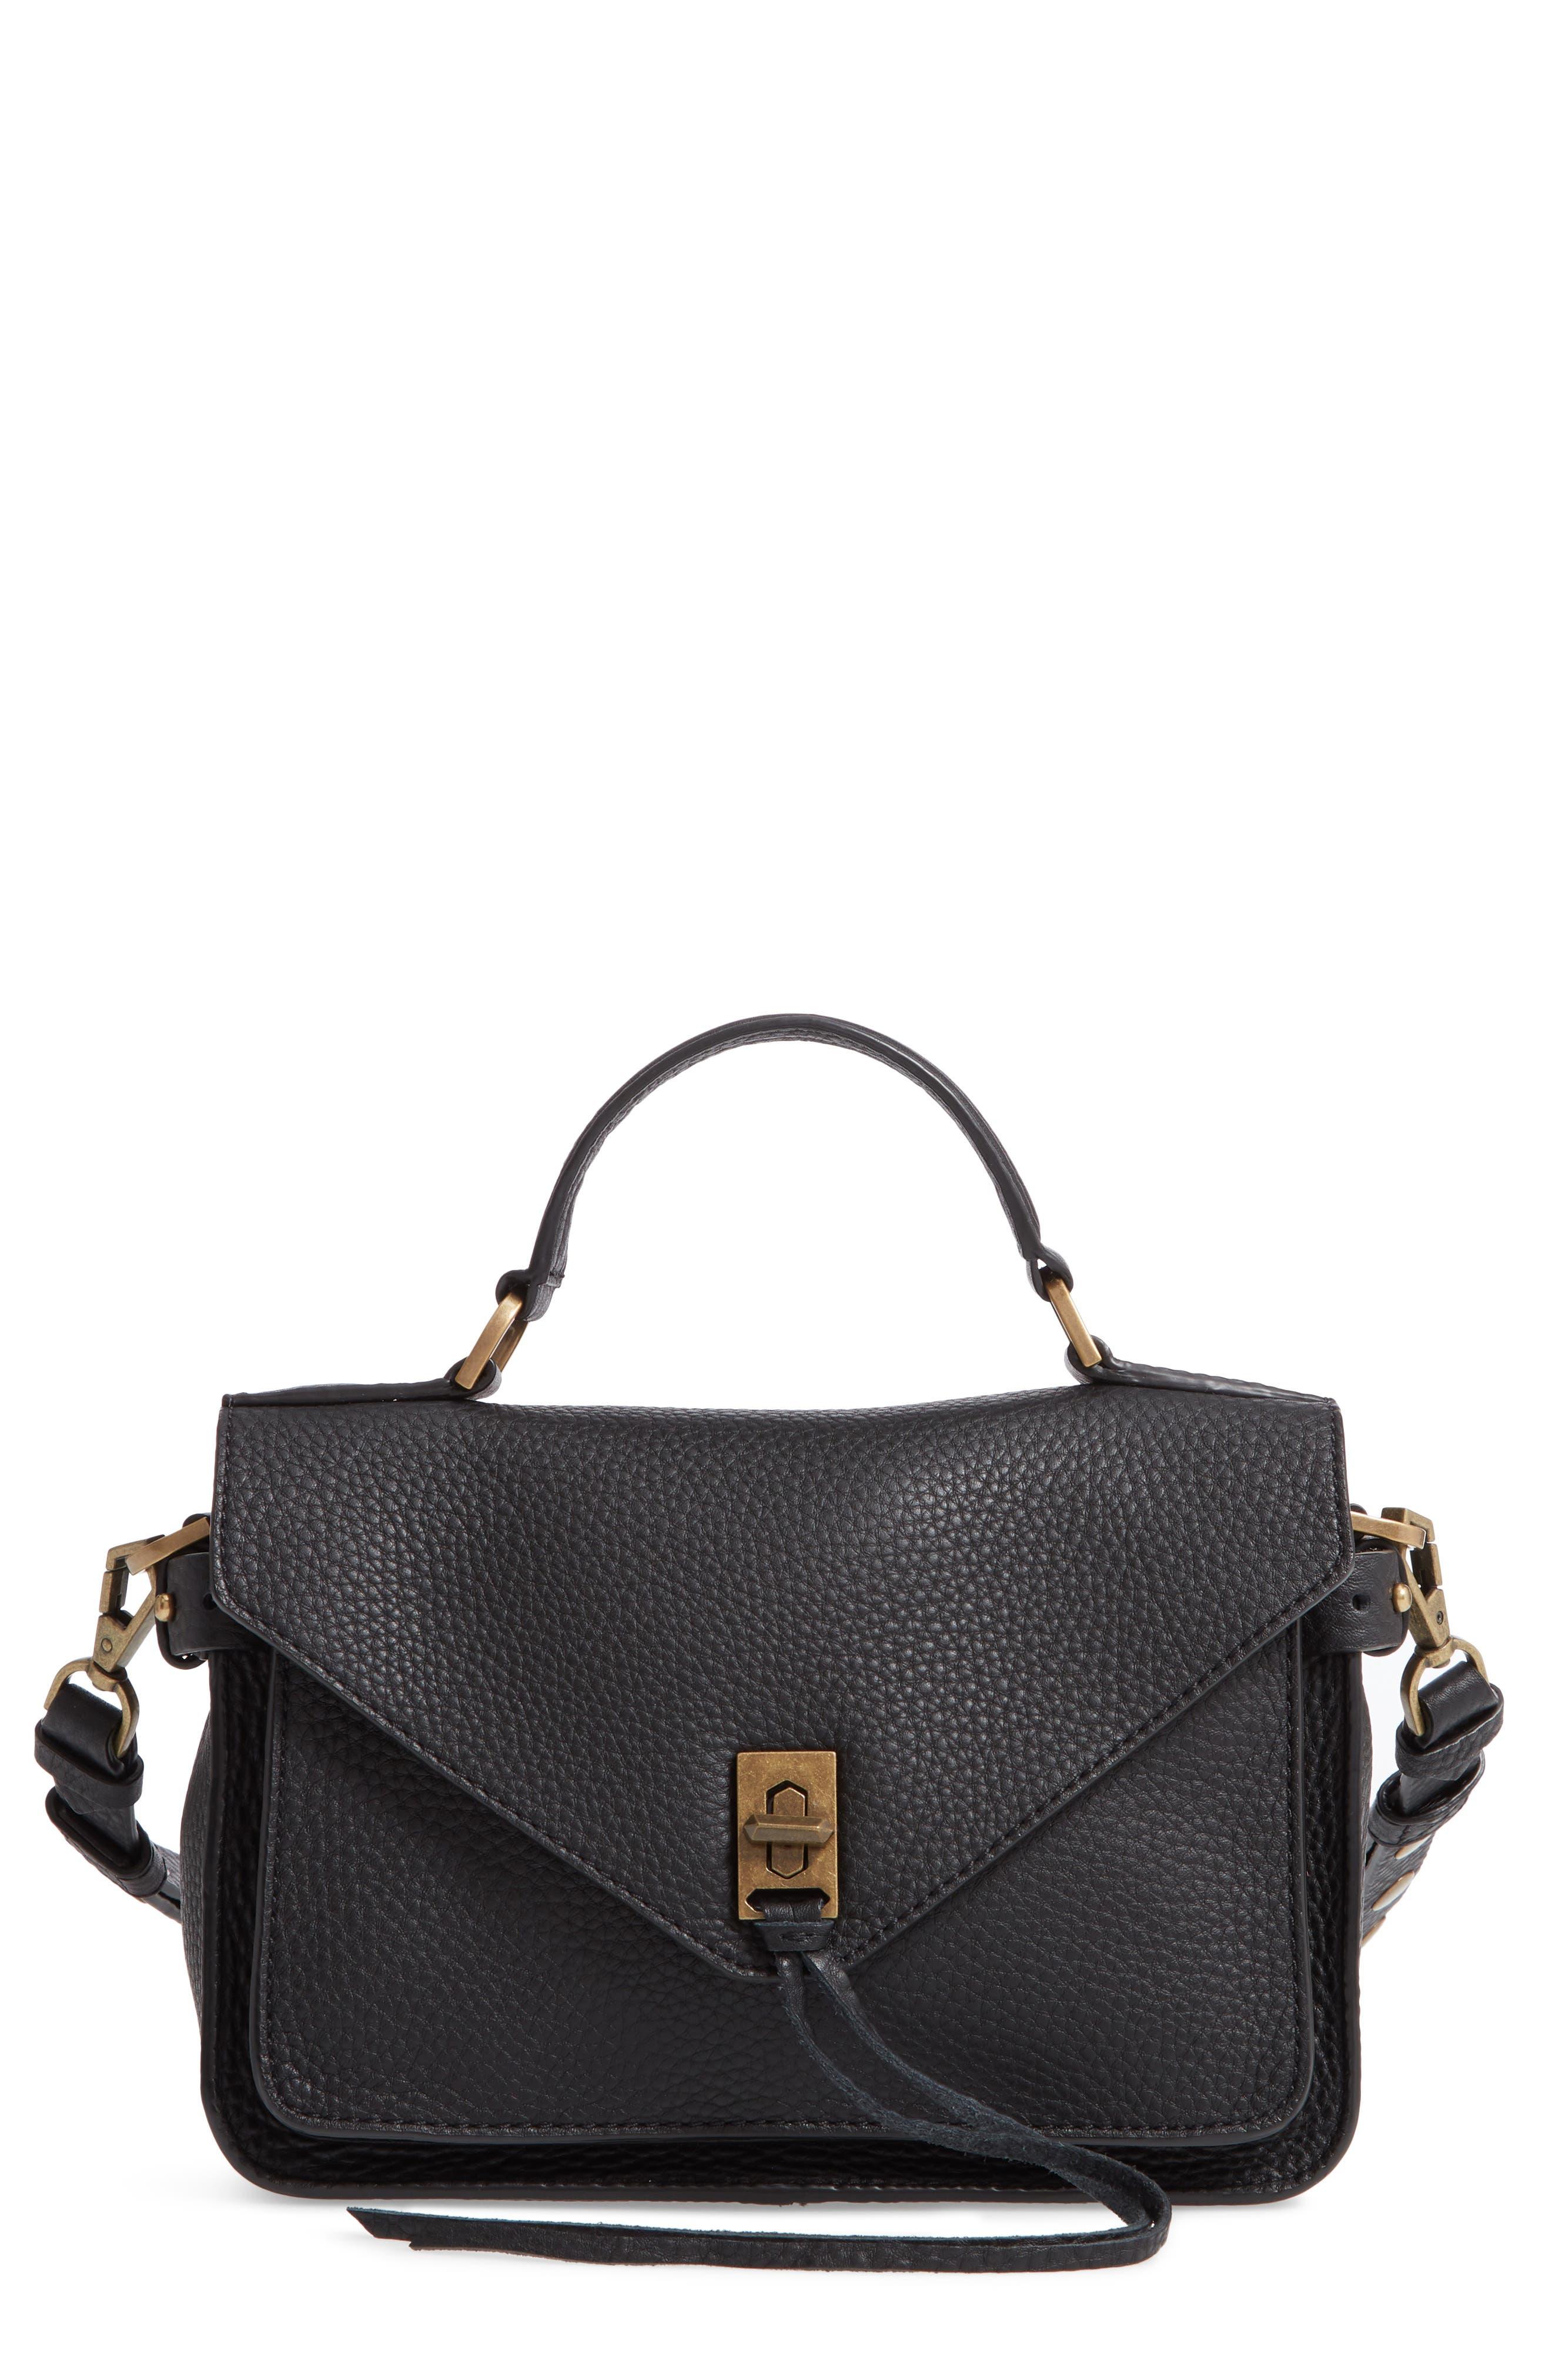 REBECCA MINKOFF, 'Small Darren' Leather Messenger Bag, Main thumbnail 1, color, BLACK